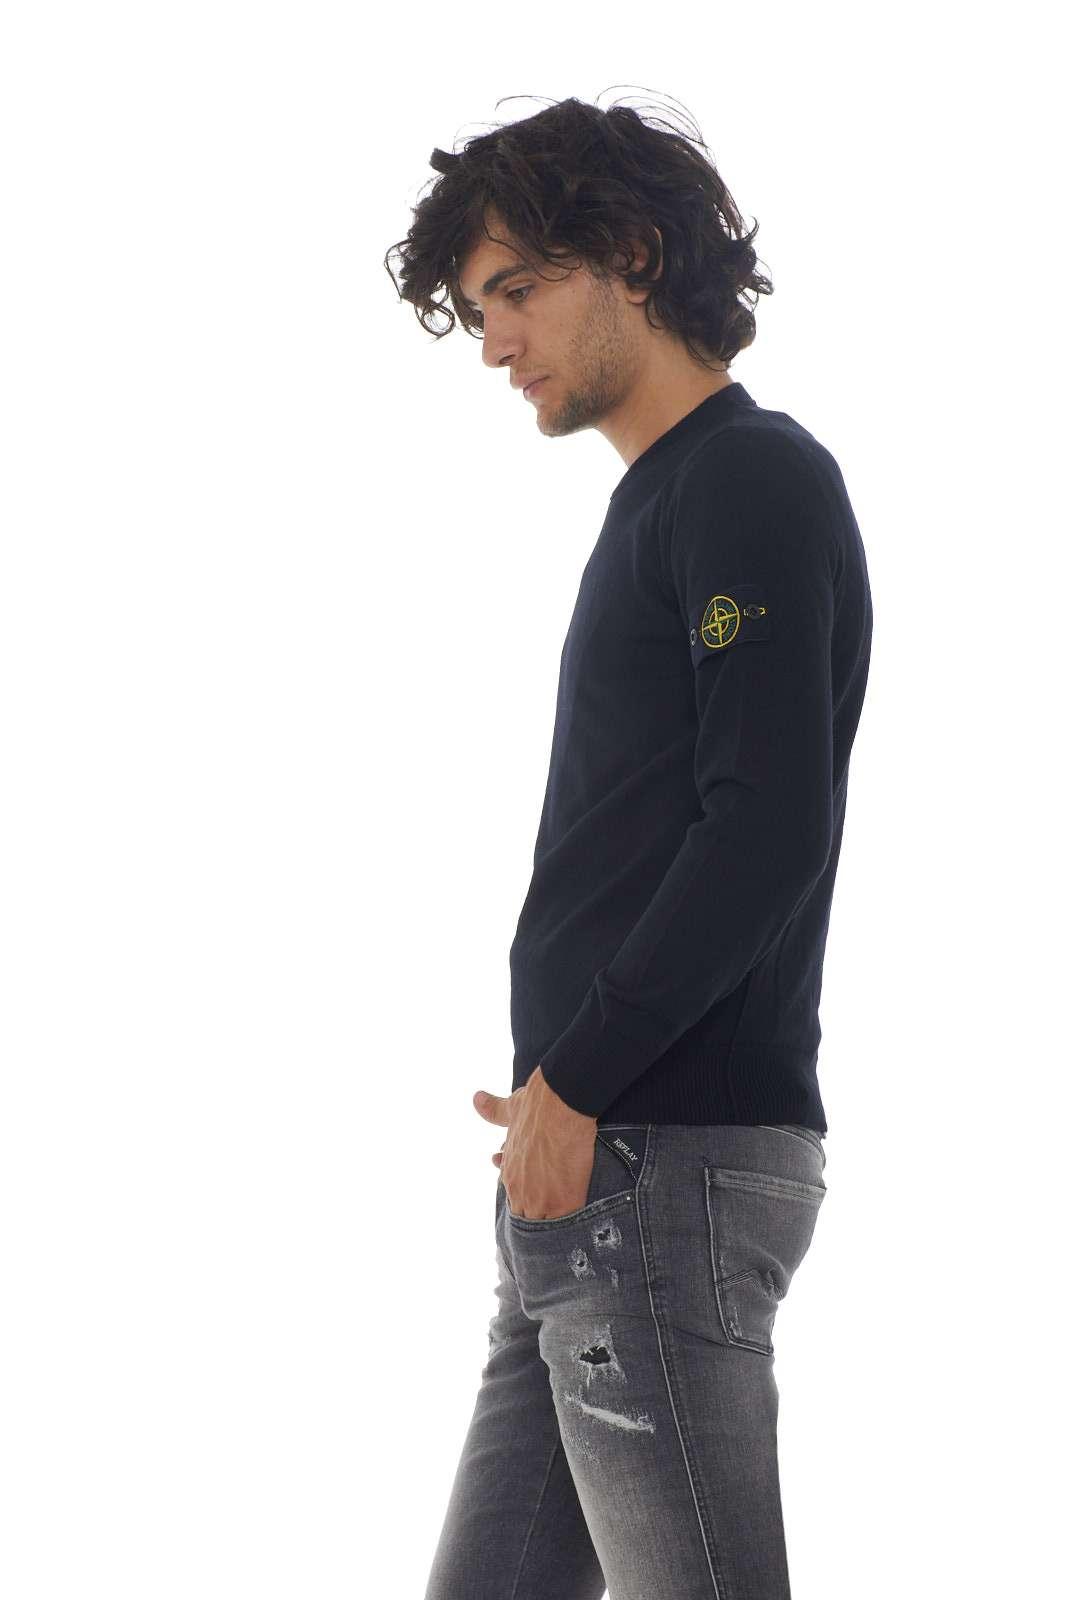 https://www.parmax.com/media/catalog/product/a/i/AI-outlet_parmax-maglia-uomo-Stone-Island-7115524C4-B.jpg